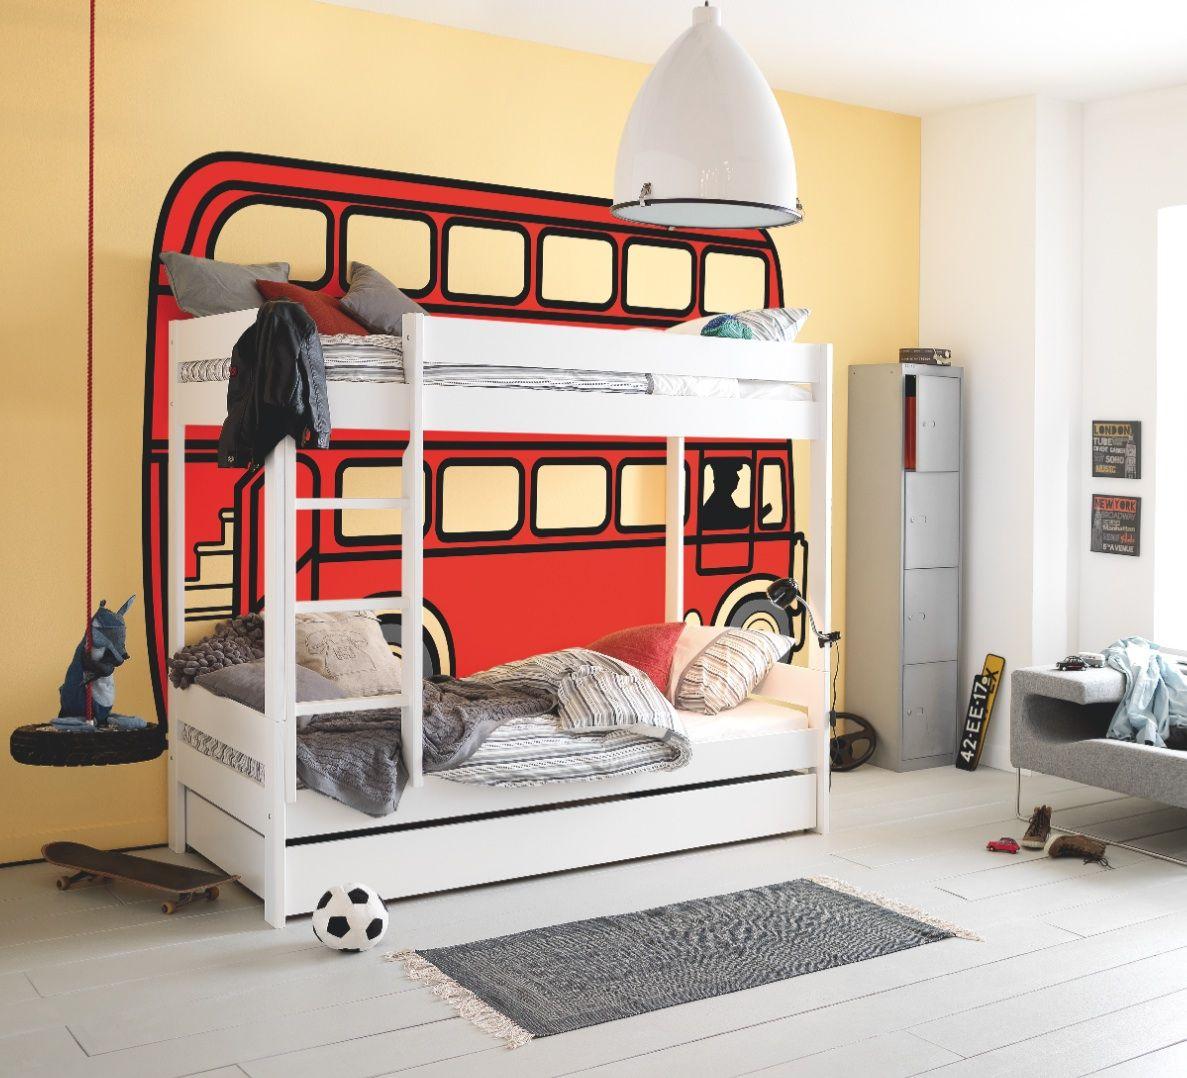 Kids bedroom Top Interieur - Kinderkamers, Tienerkamers, jeugdkamers ...